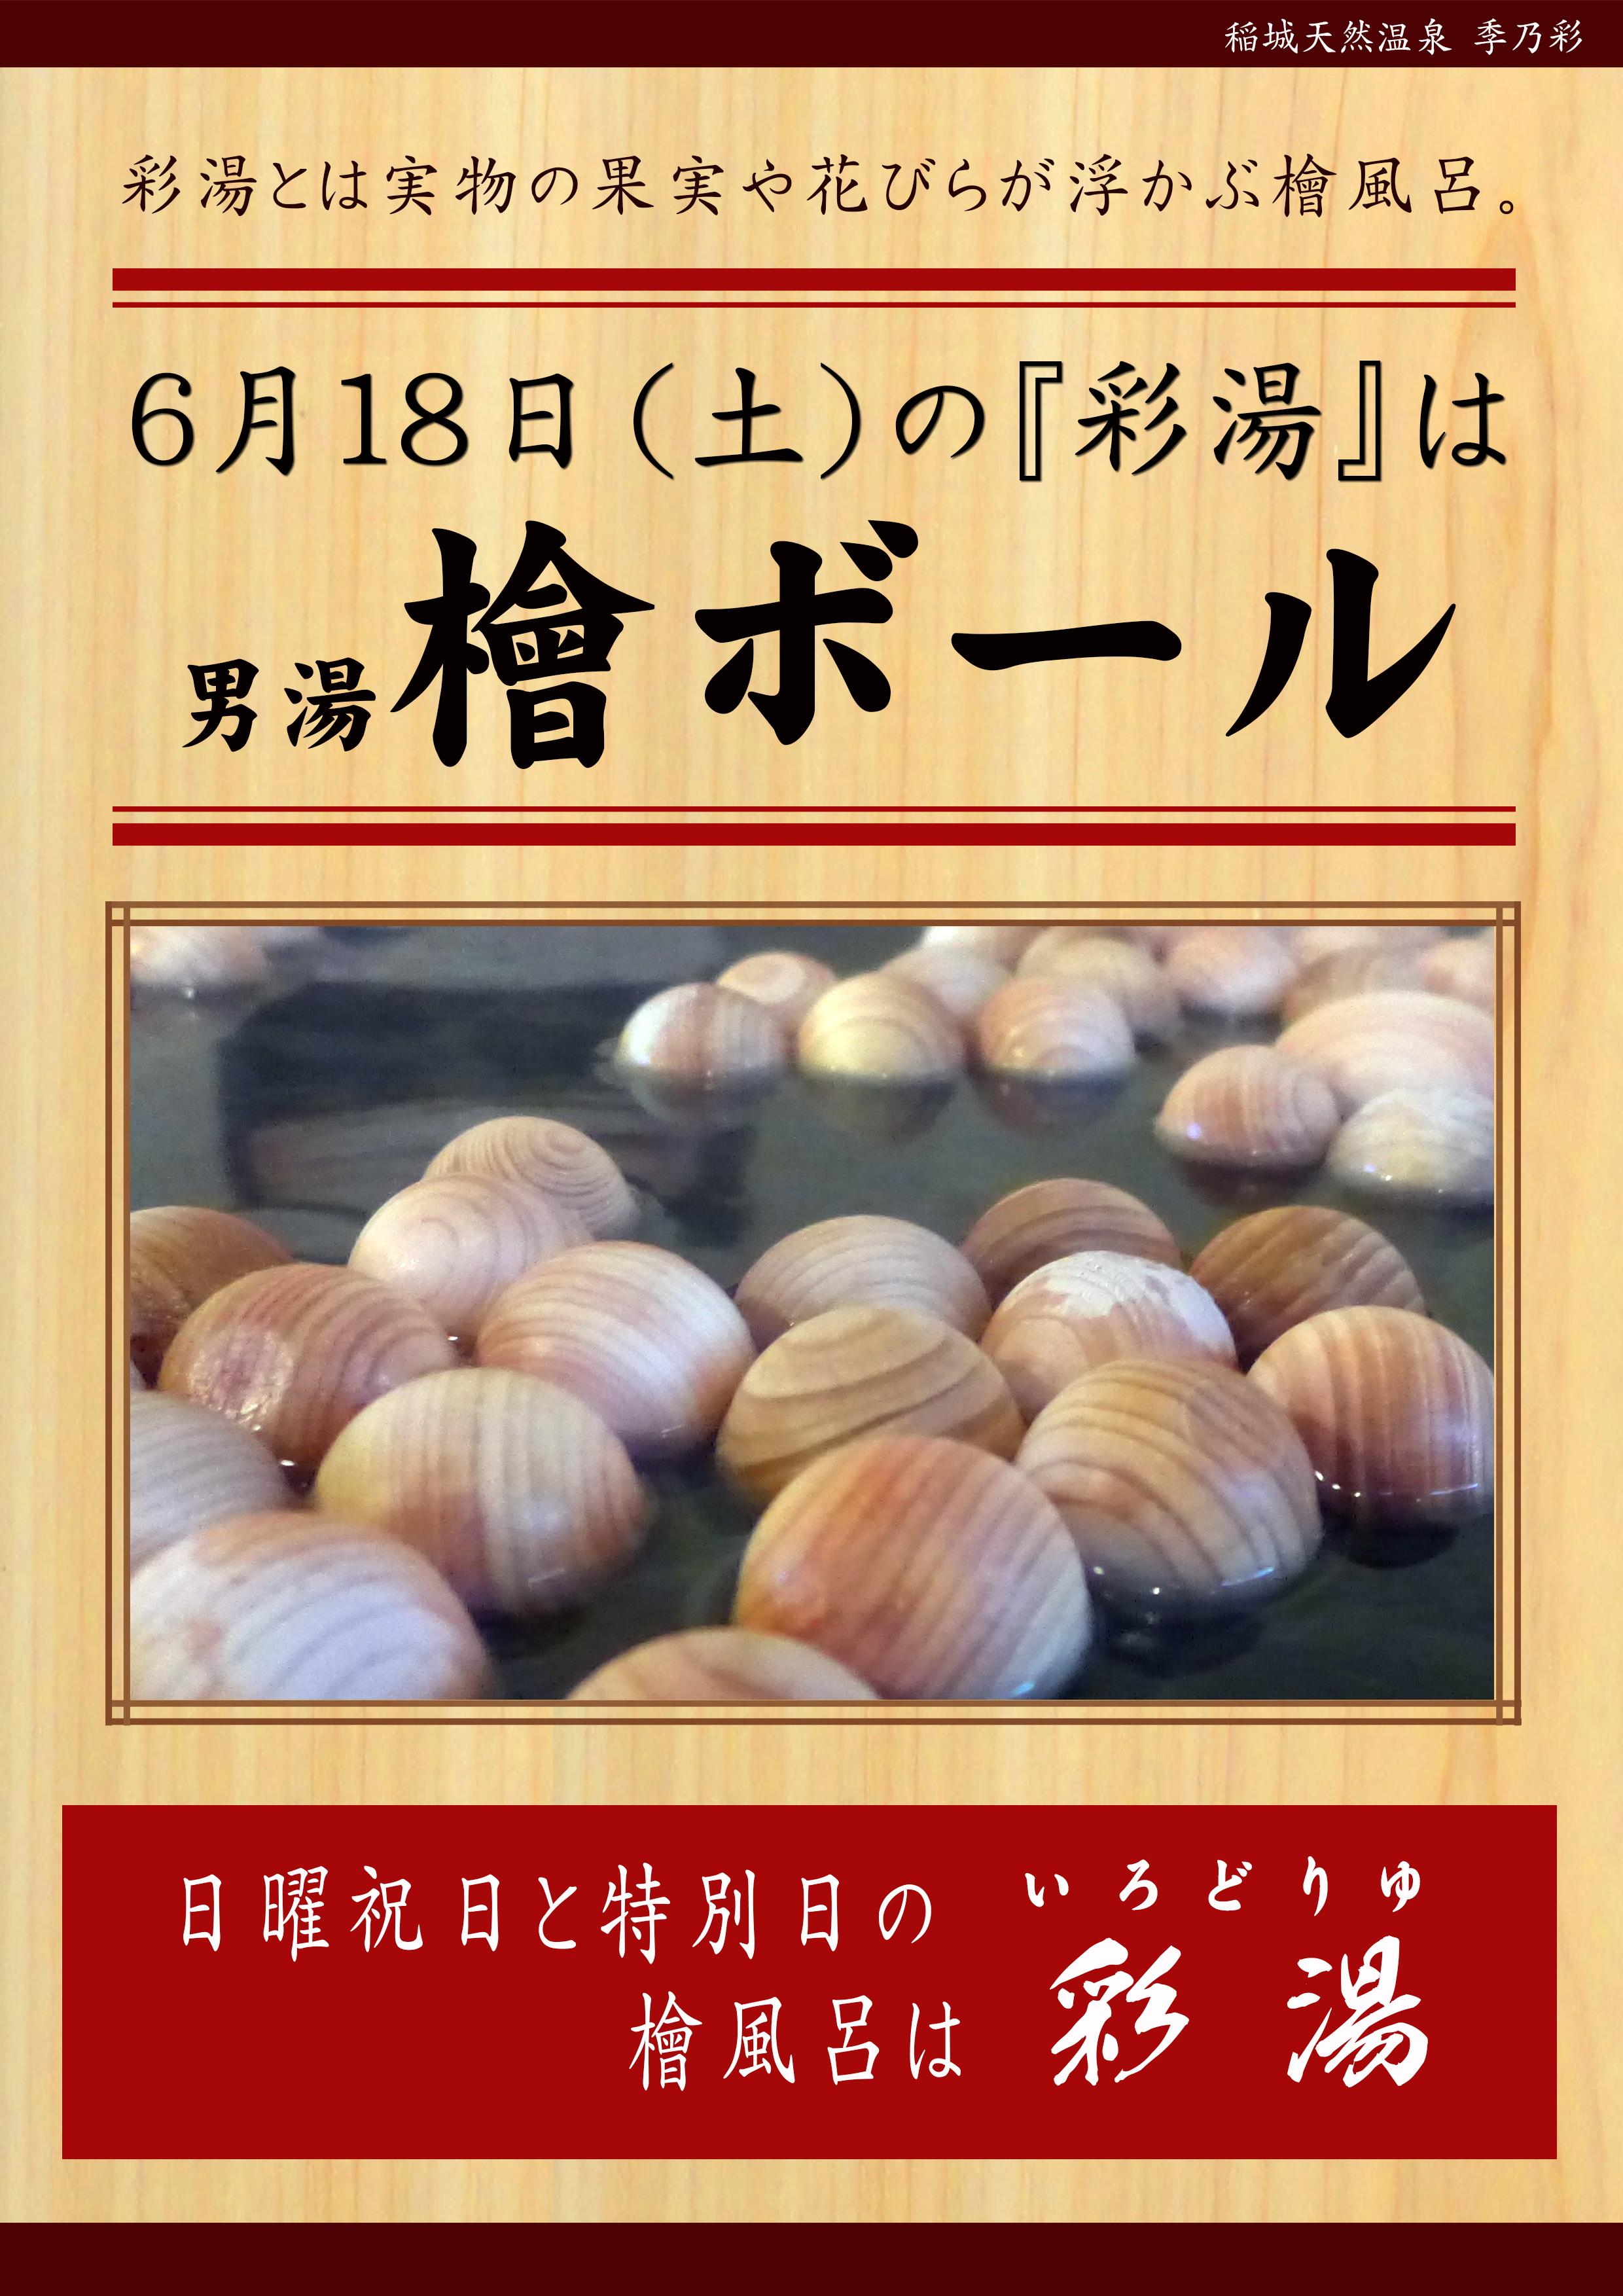 20160618 POP イベント 彩湯 男湯 檜ボール